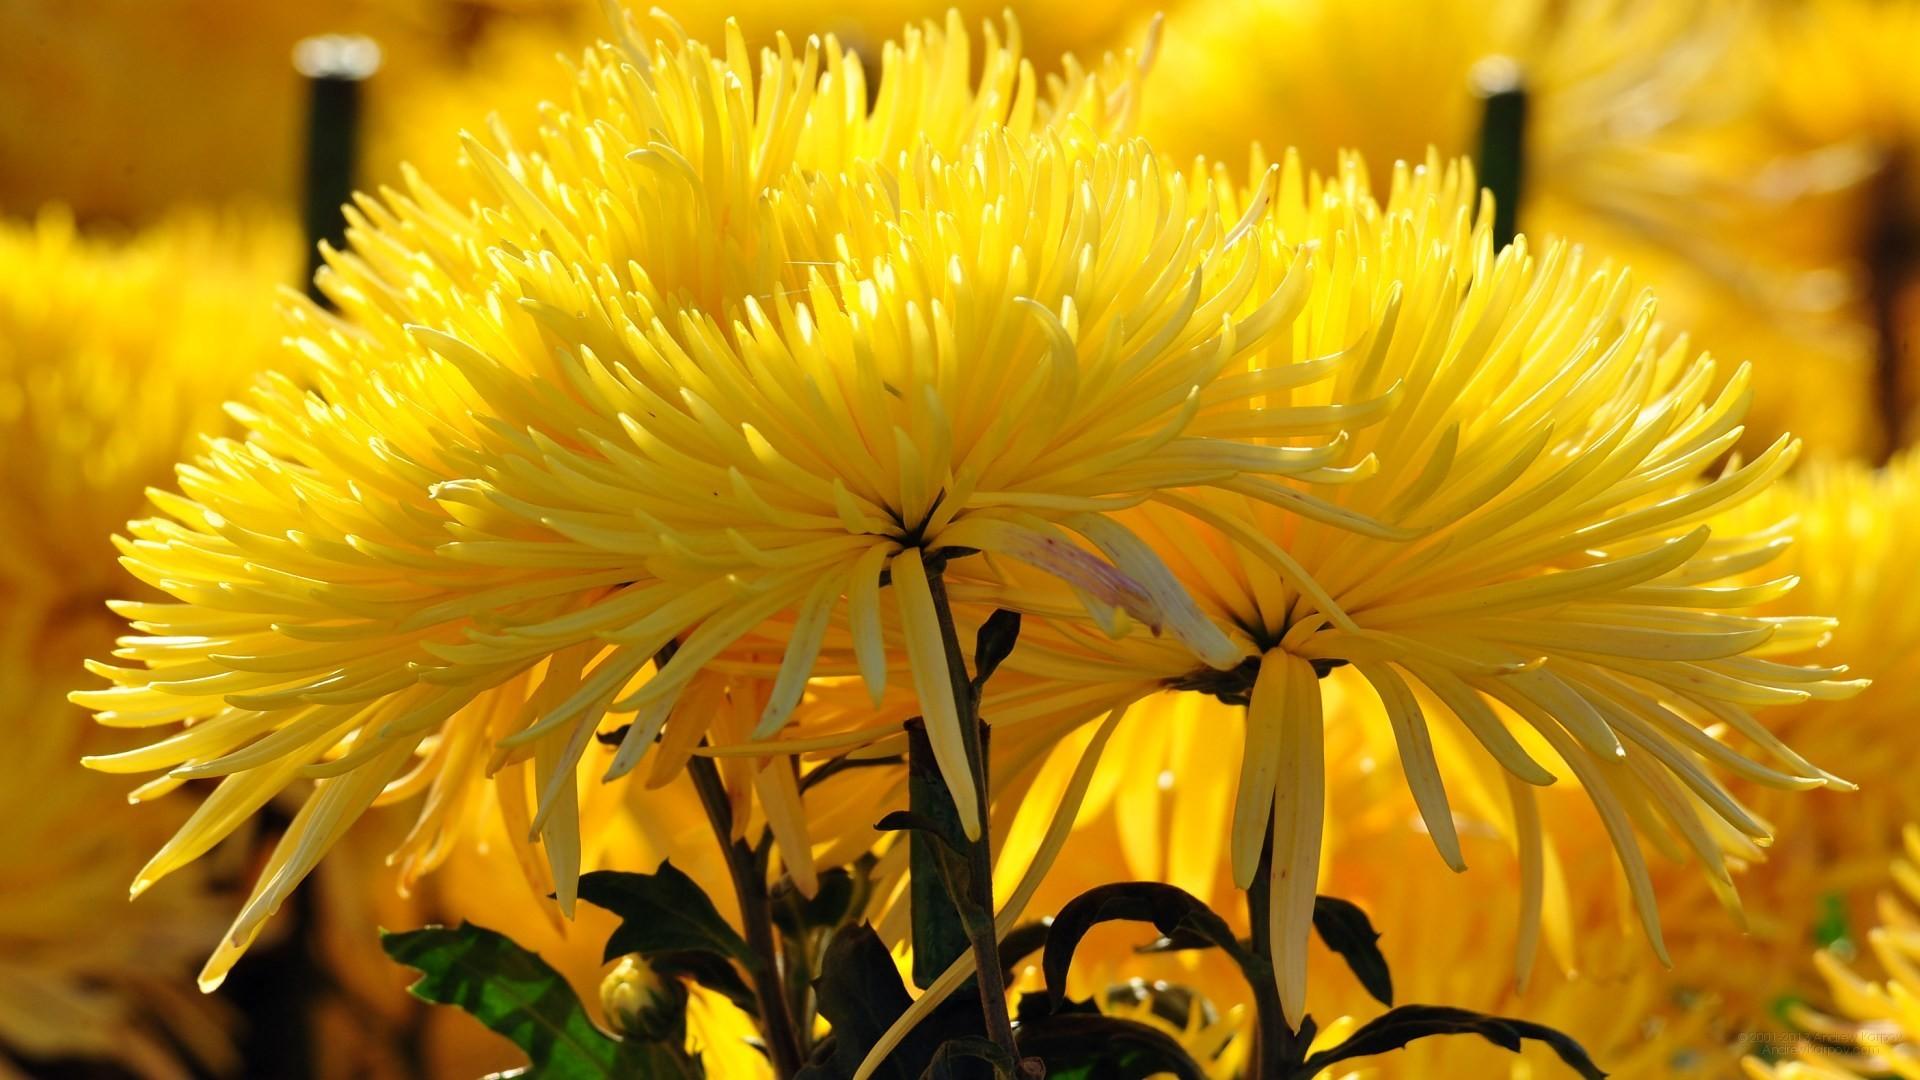 image-wallpaper-1920-1080-Beautiful-Flowers-Chrysanthemum-Flowers .